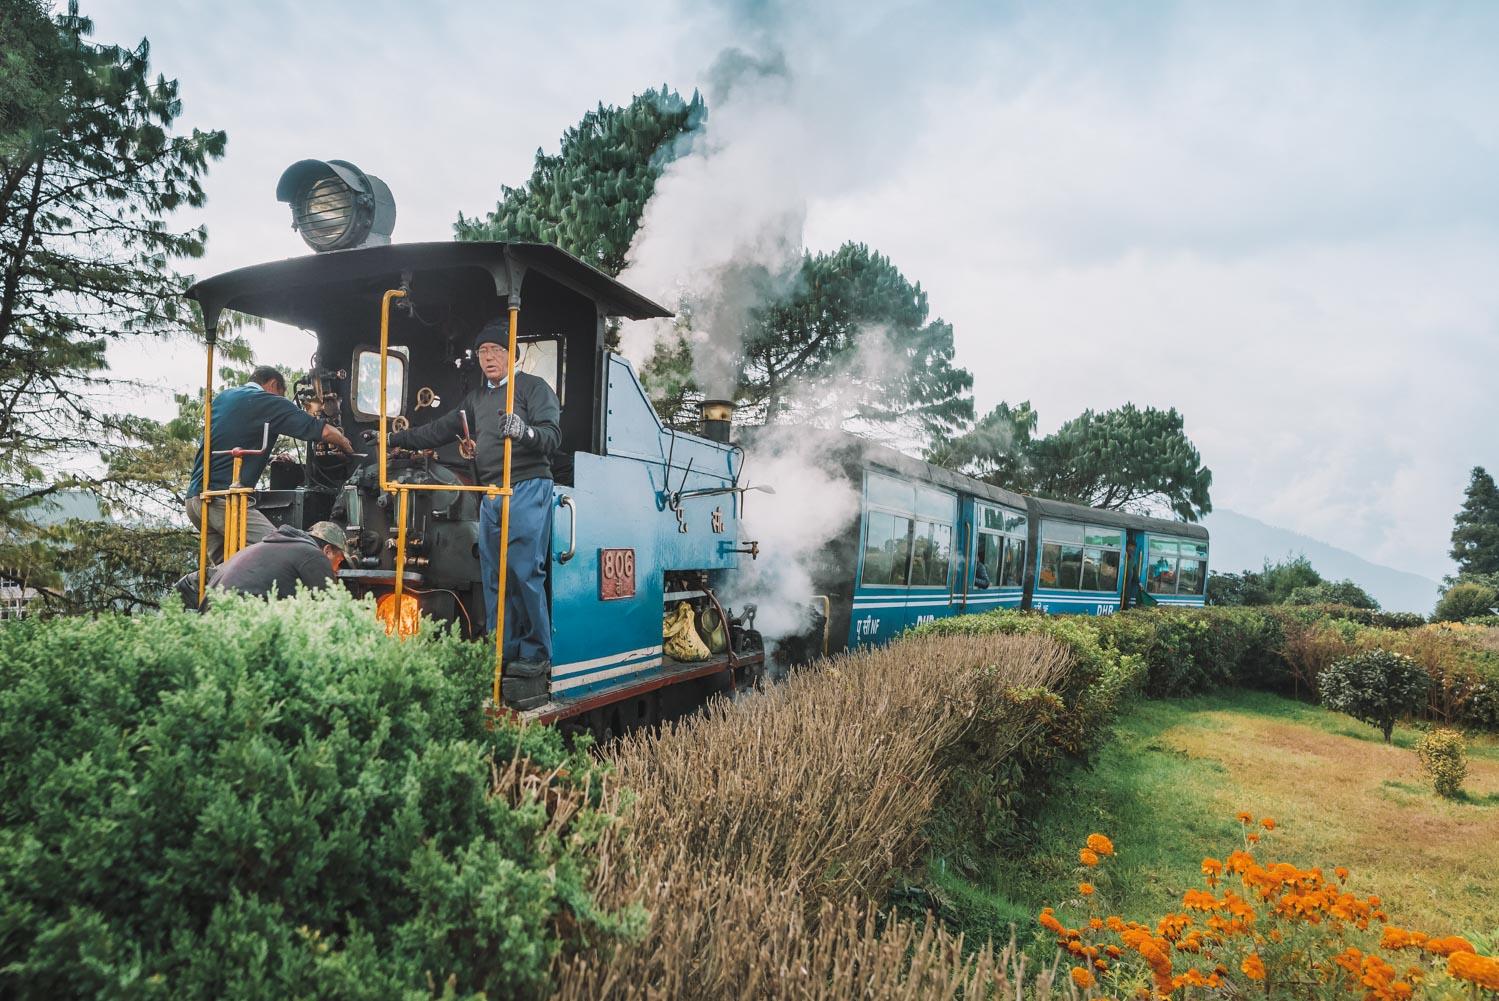 train darjeeeling india